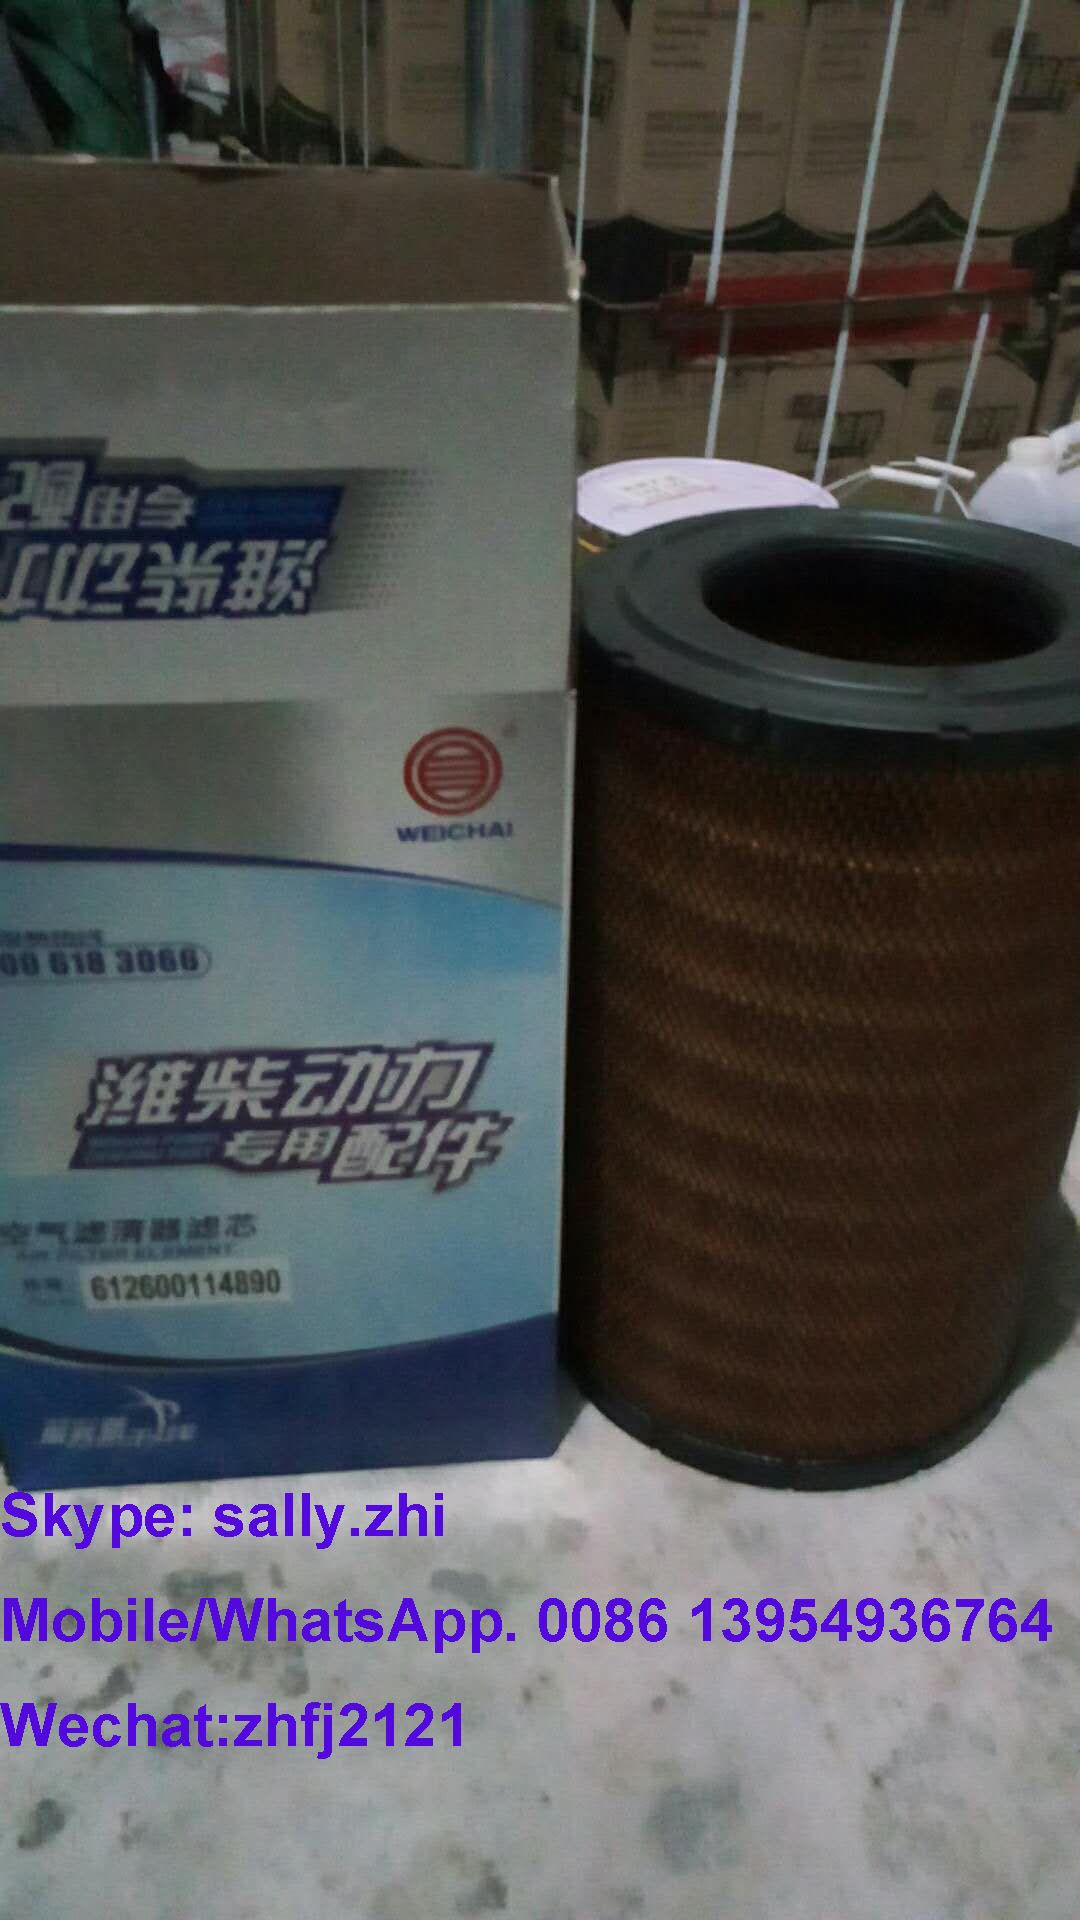 original Air filter, 612600114890 for weichai TD226B